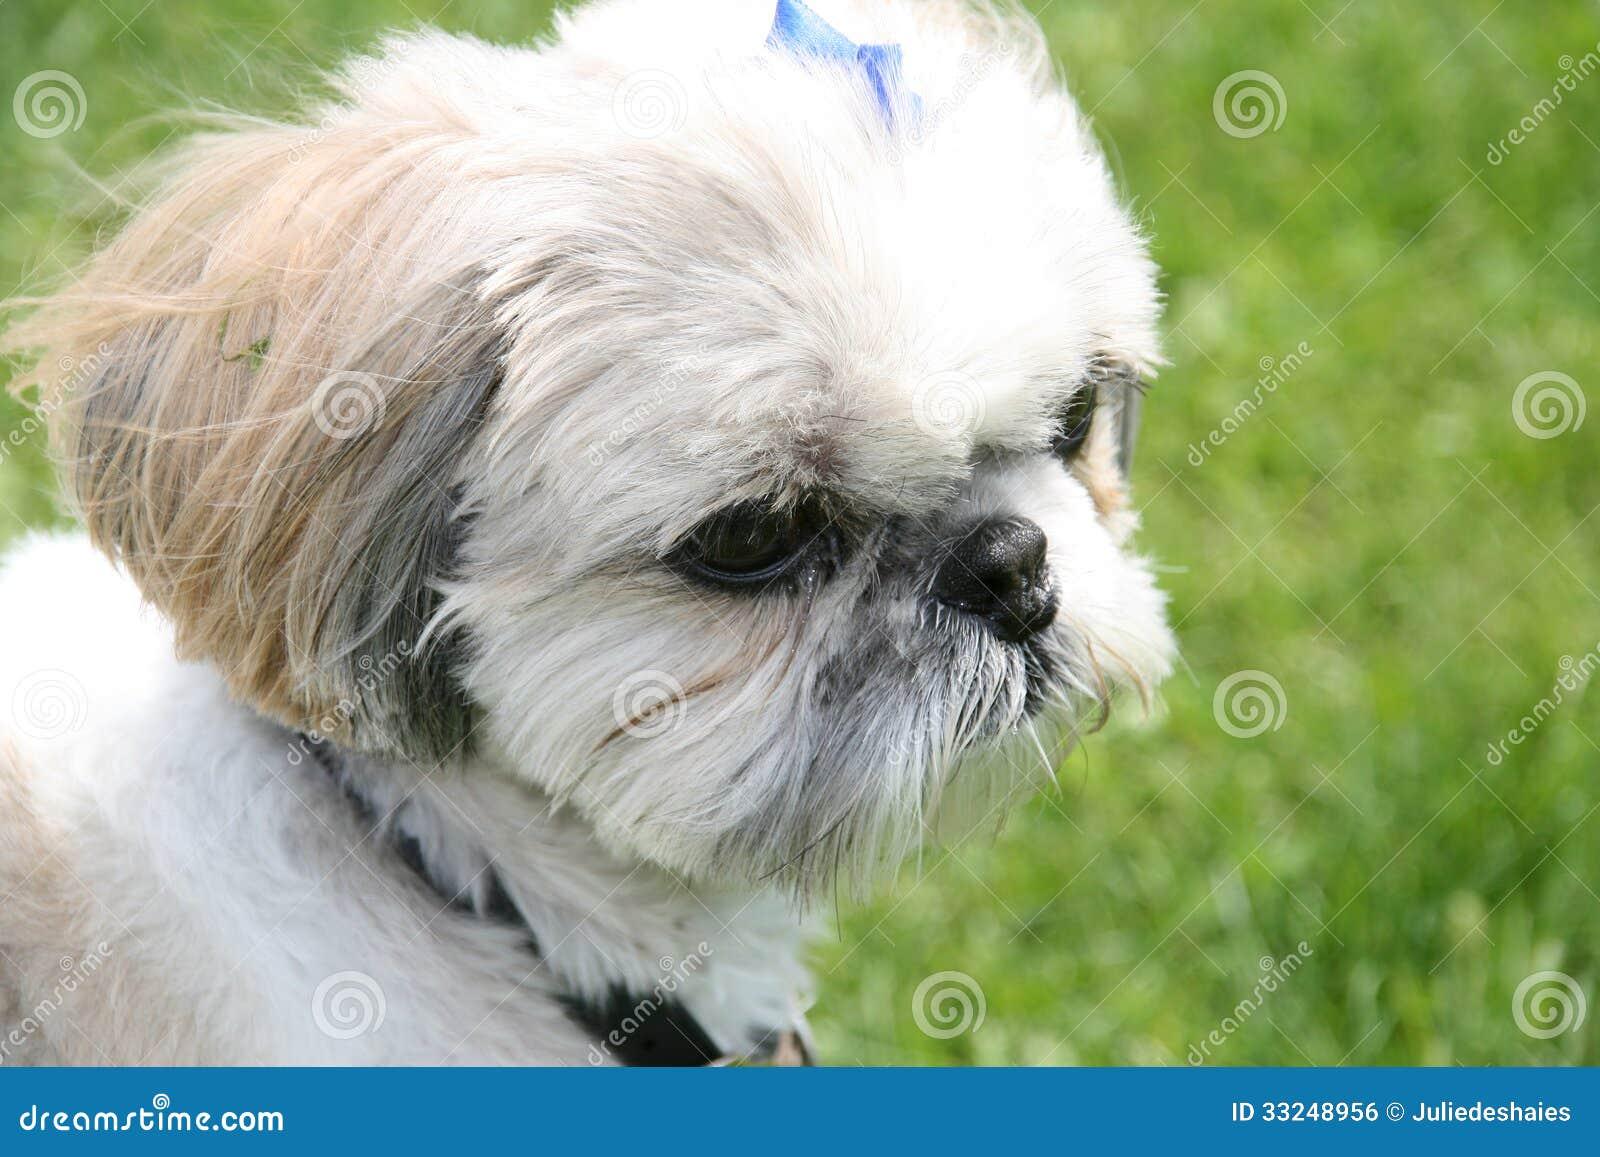 Shih Tzu dog portrait